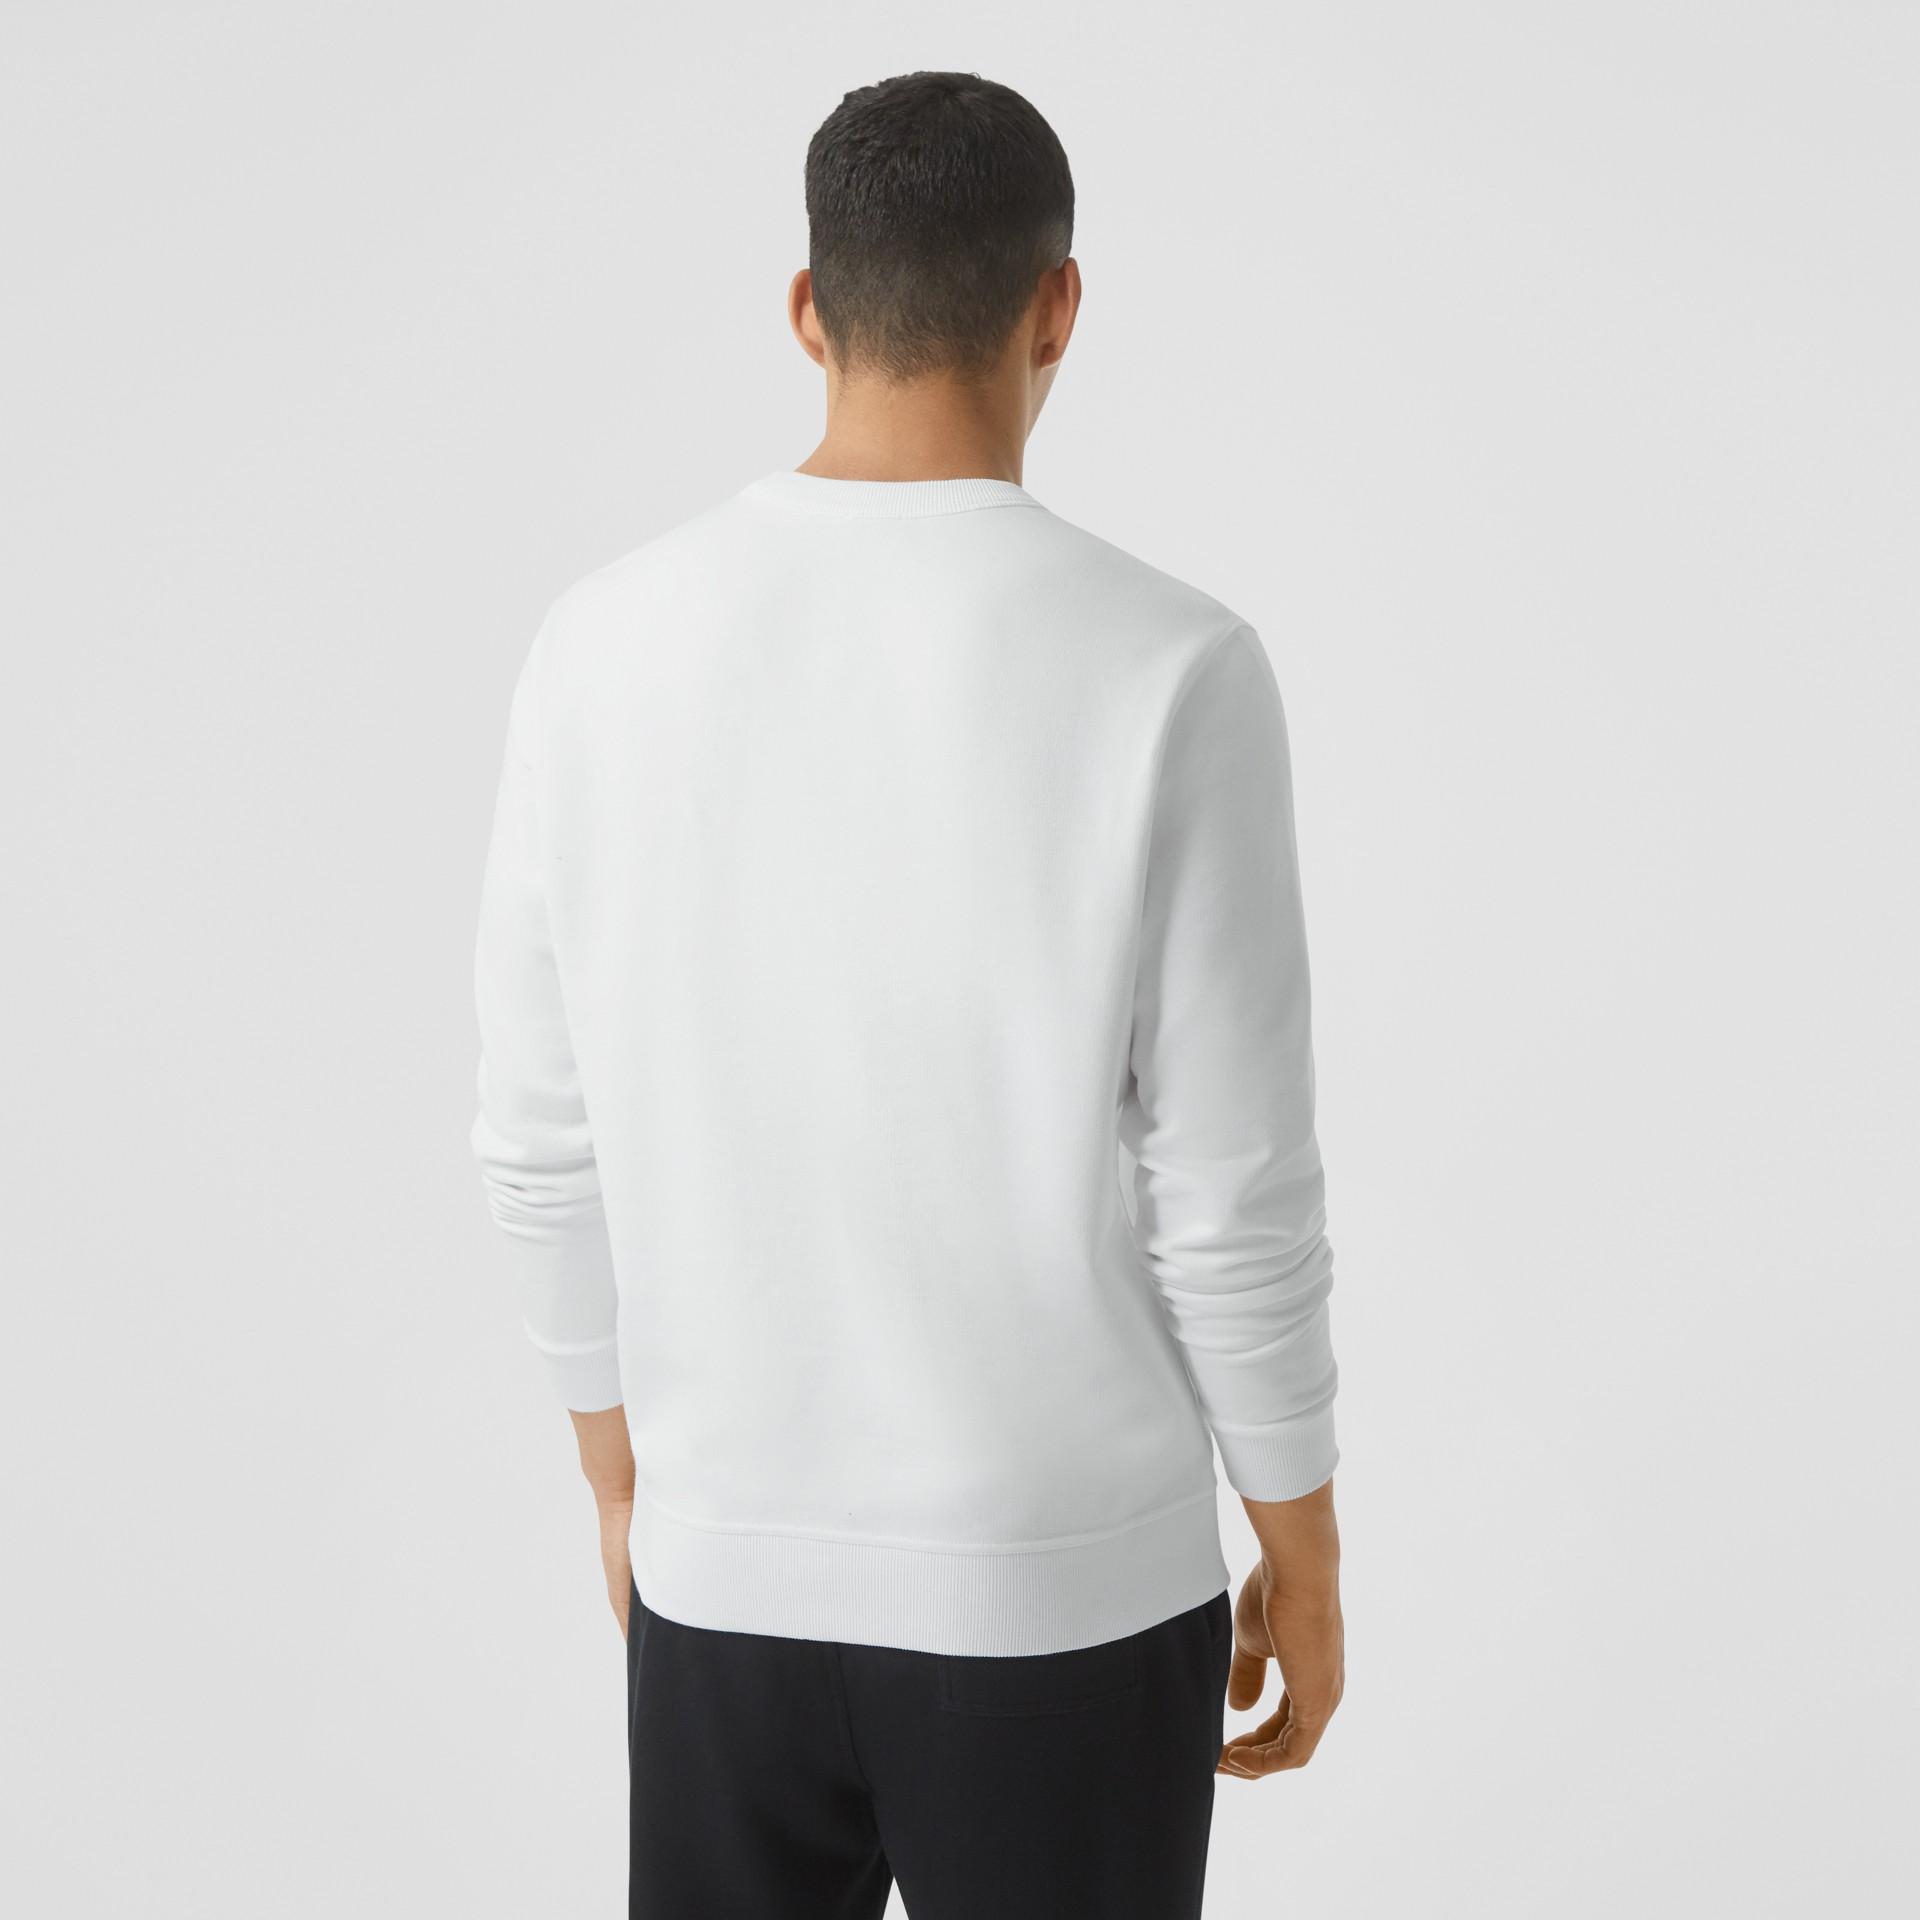 Tape Print Cotton Sweatshirt in White - Men | Burberry - gallery image 2